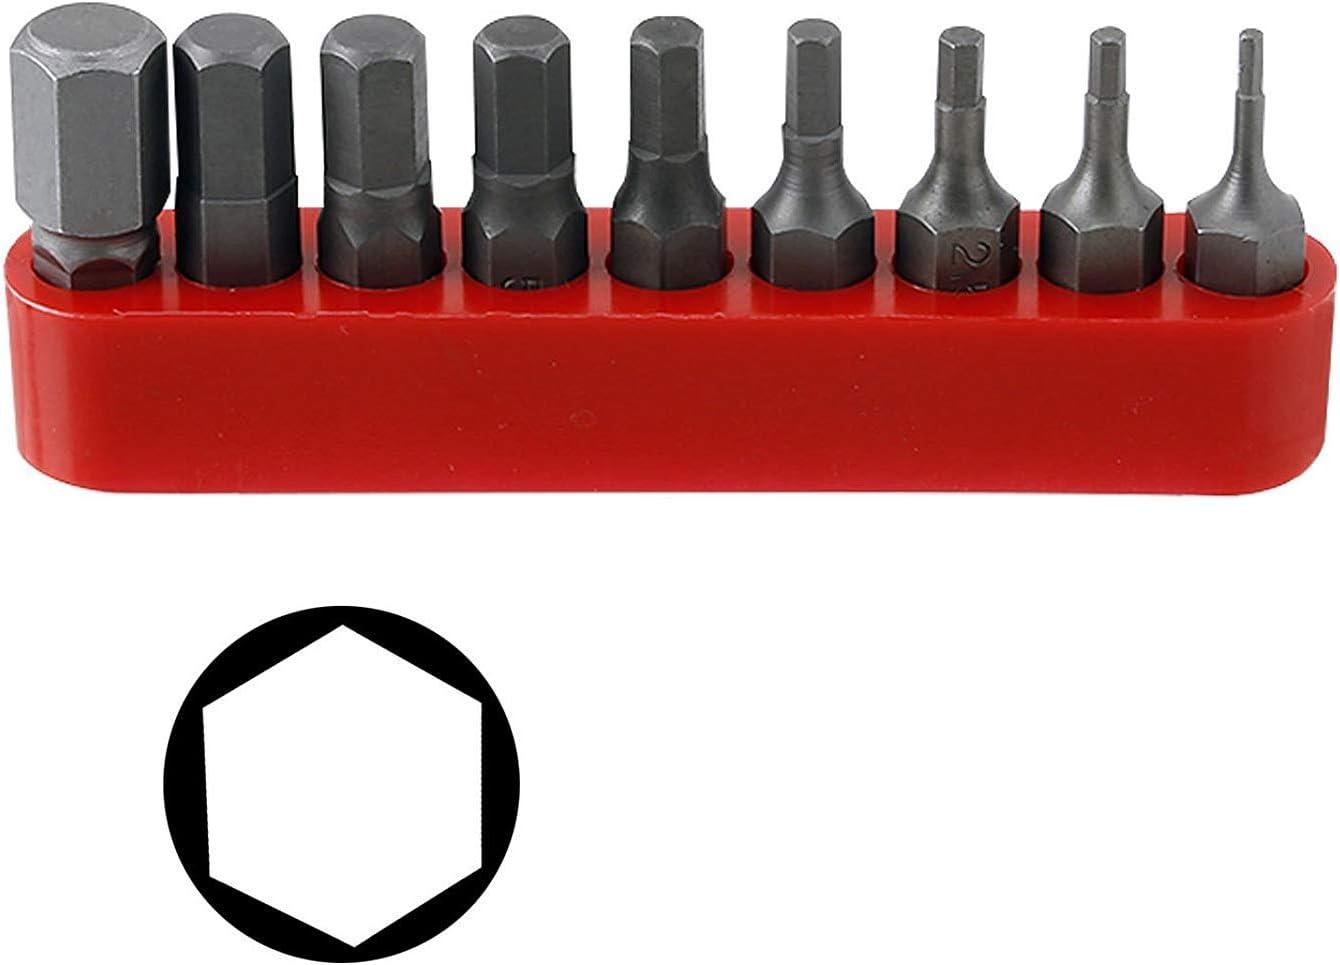 Driver Steel T-Handle Screws Furnitures Metric Long High quality Useful